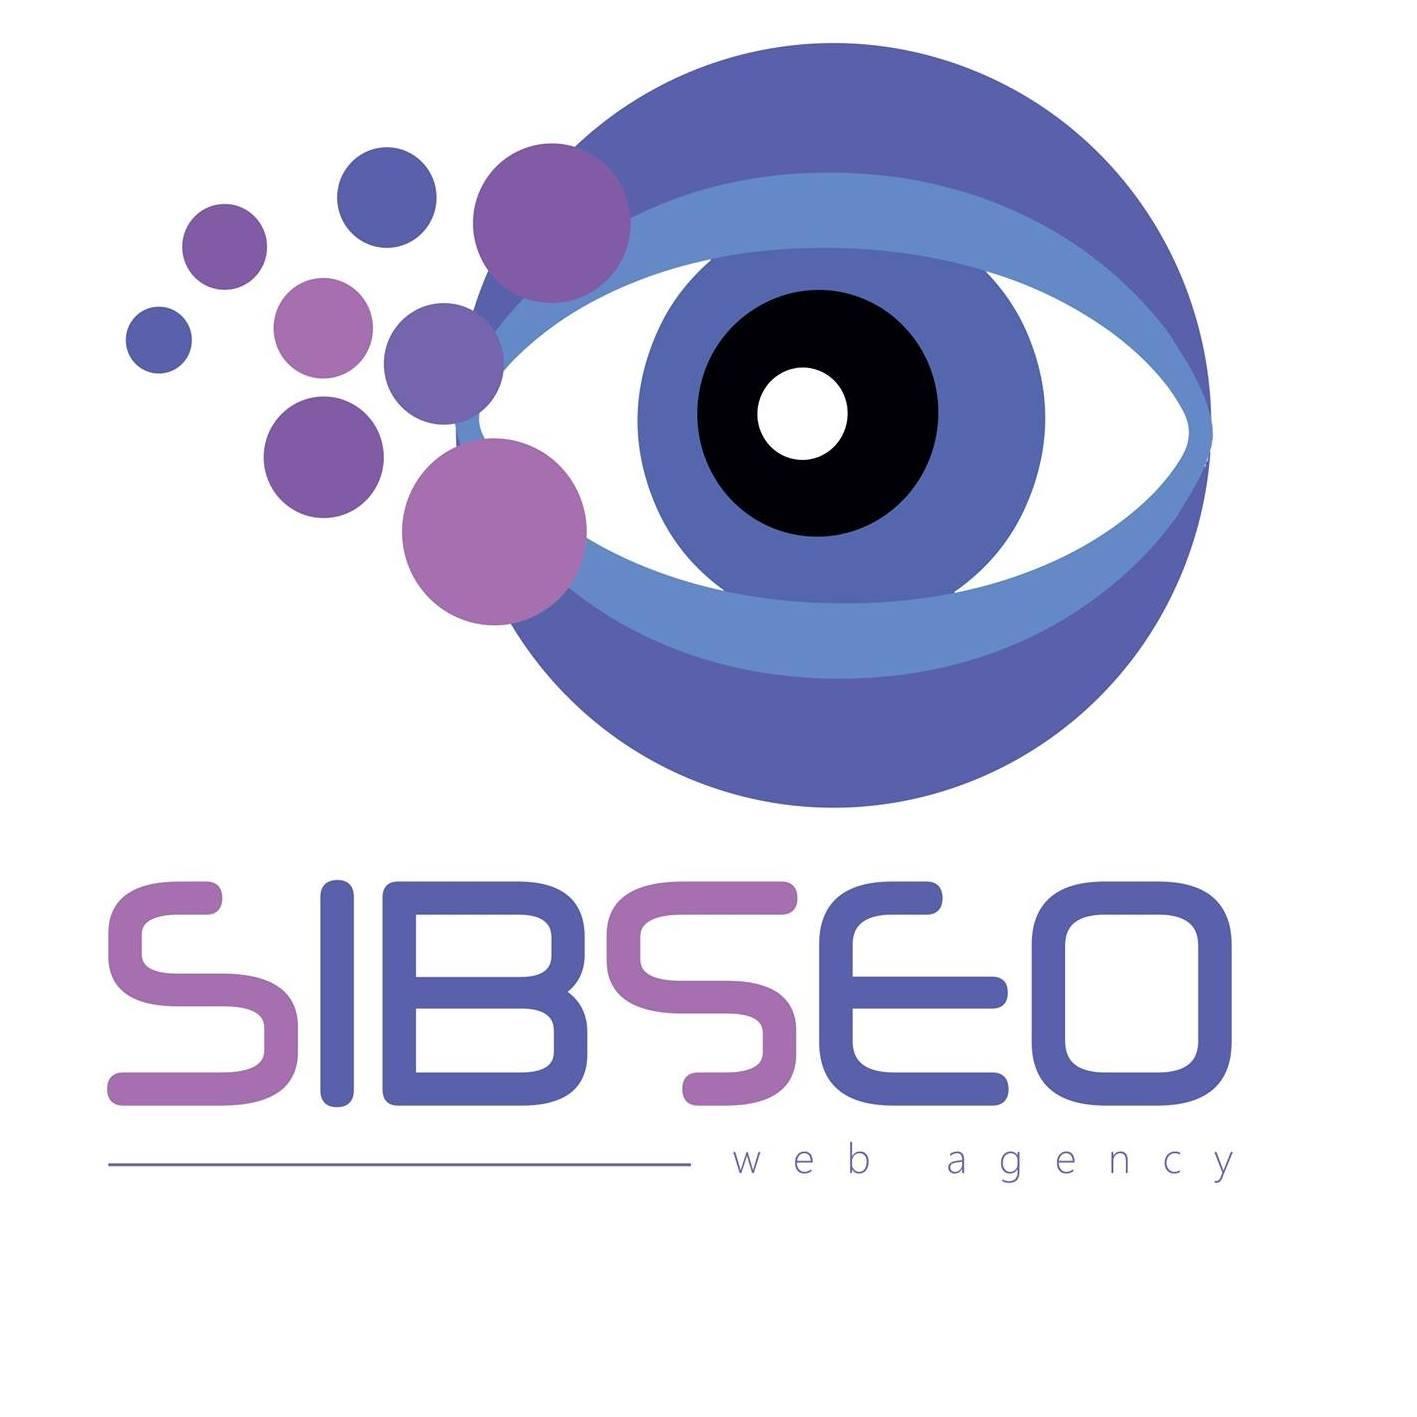 sibseo.com